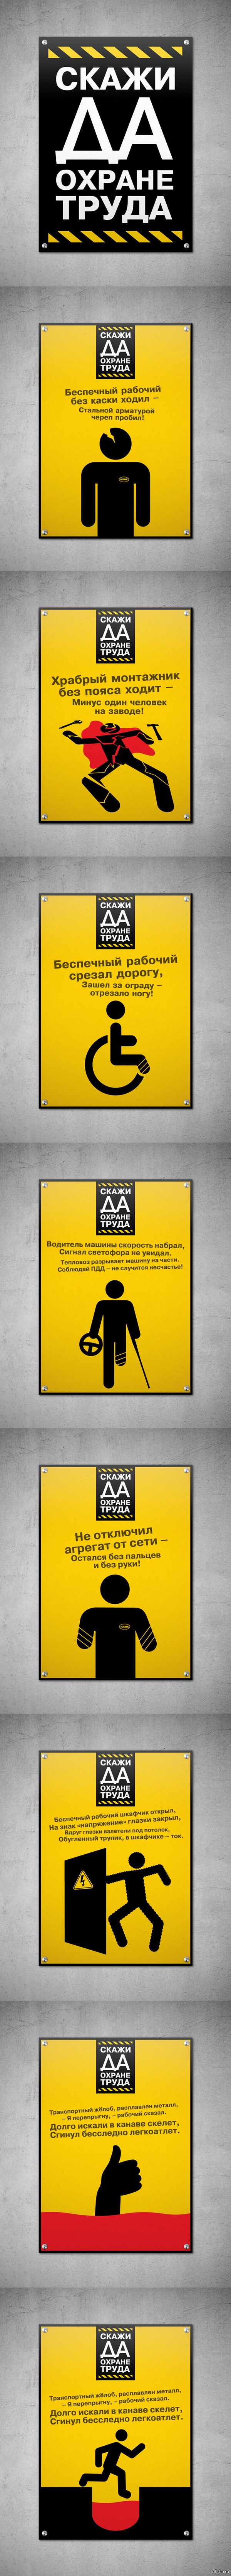 Серия плакатов «Скажи ДА охране труда»